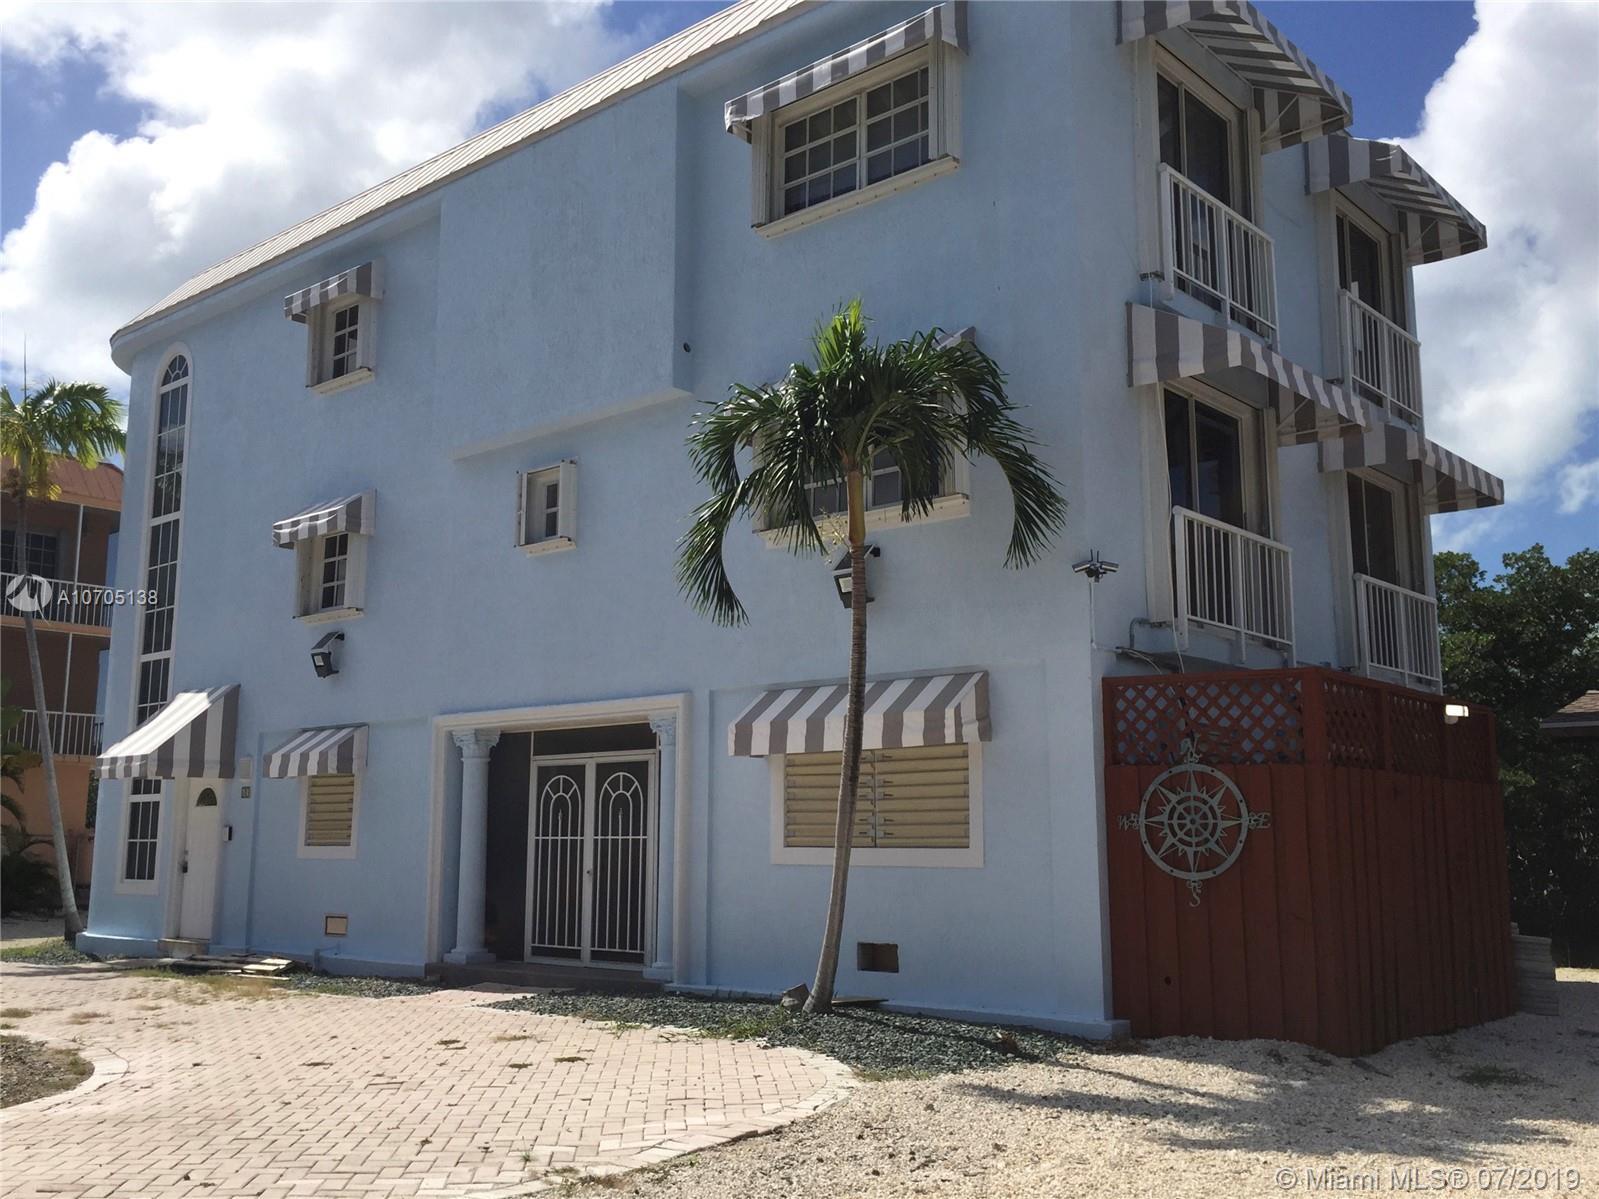 65 Waterways Dr, Other City - Keys/Islands/Caribb, FL 33037 - Other City - Keys/Islands/Caribb, FL real estate listing